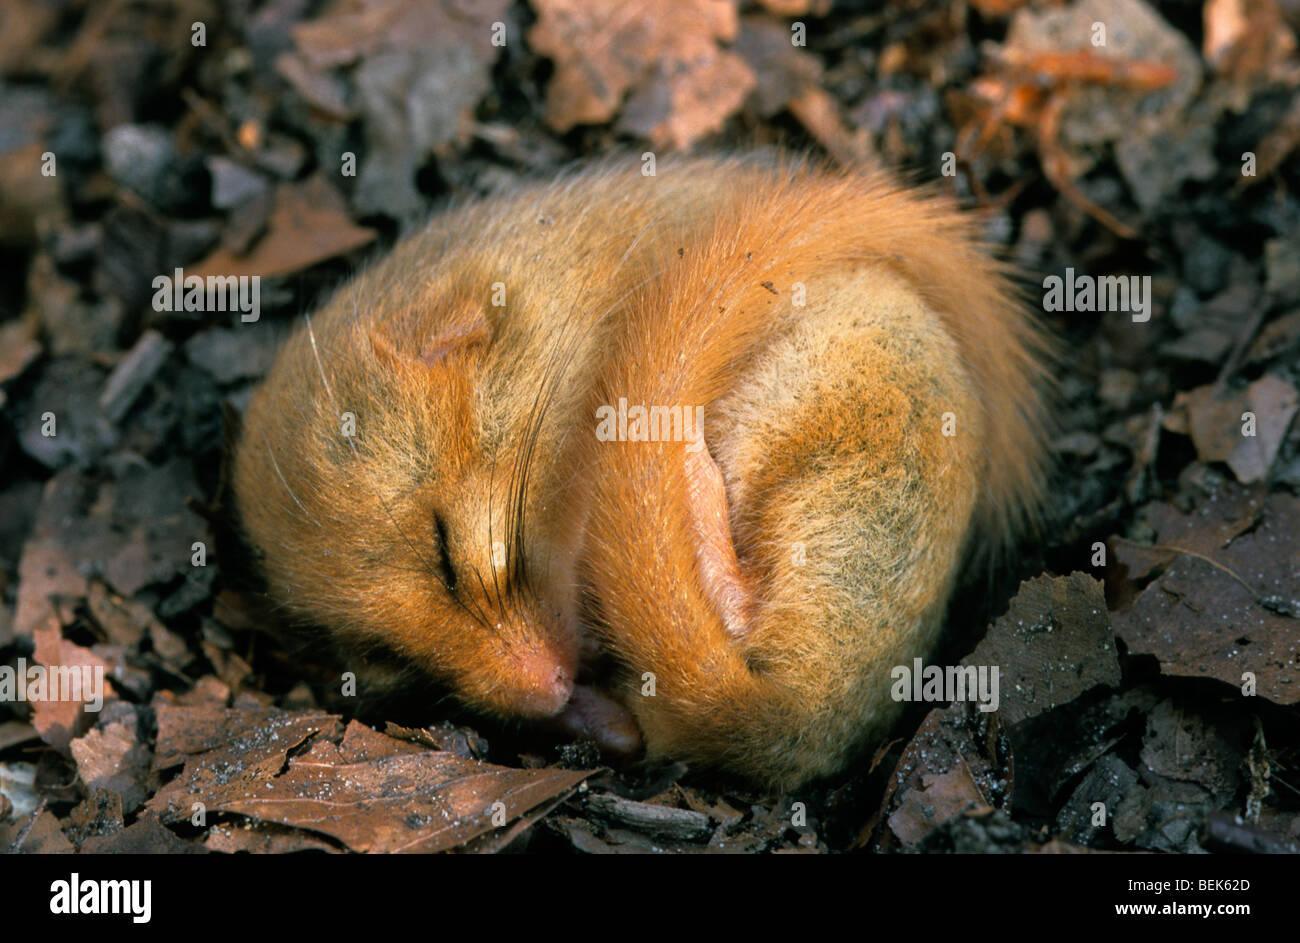 Common dormouse / hazel dormouse (Muscardinus avellanarius) sleeping in leaf litter on forest floor during hibernation - Stock Image